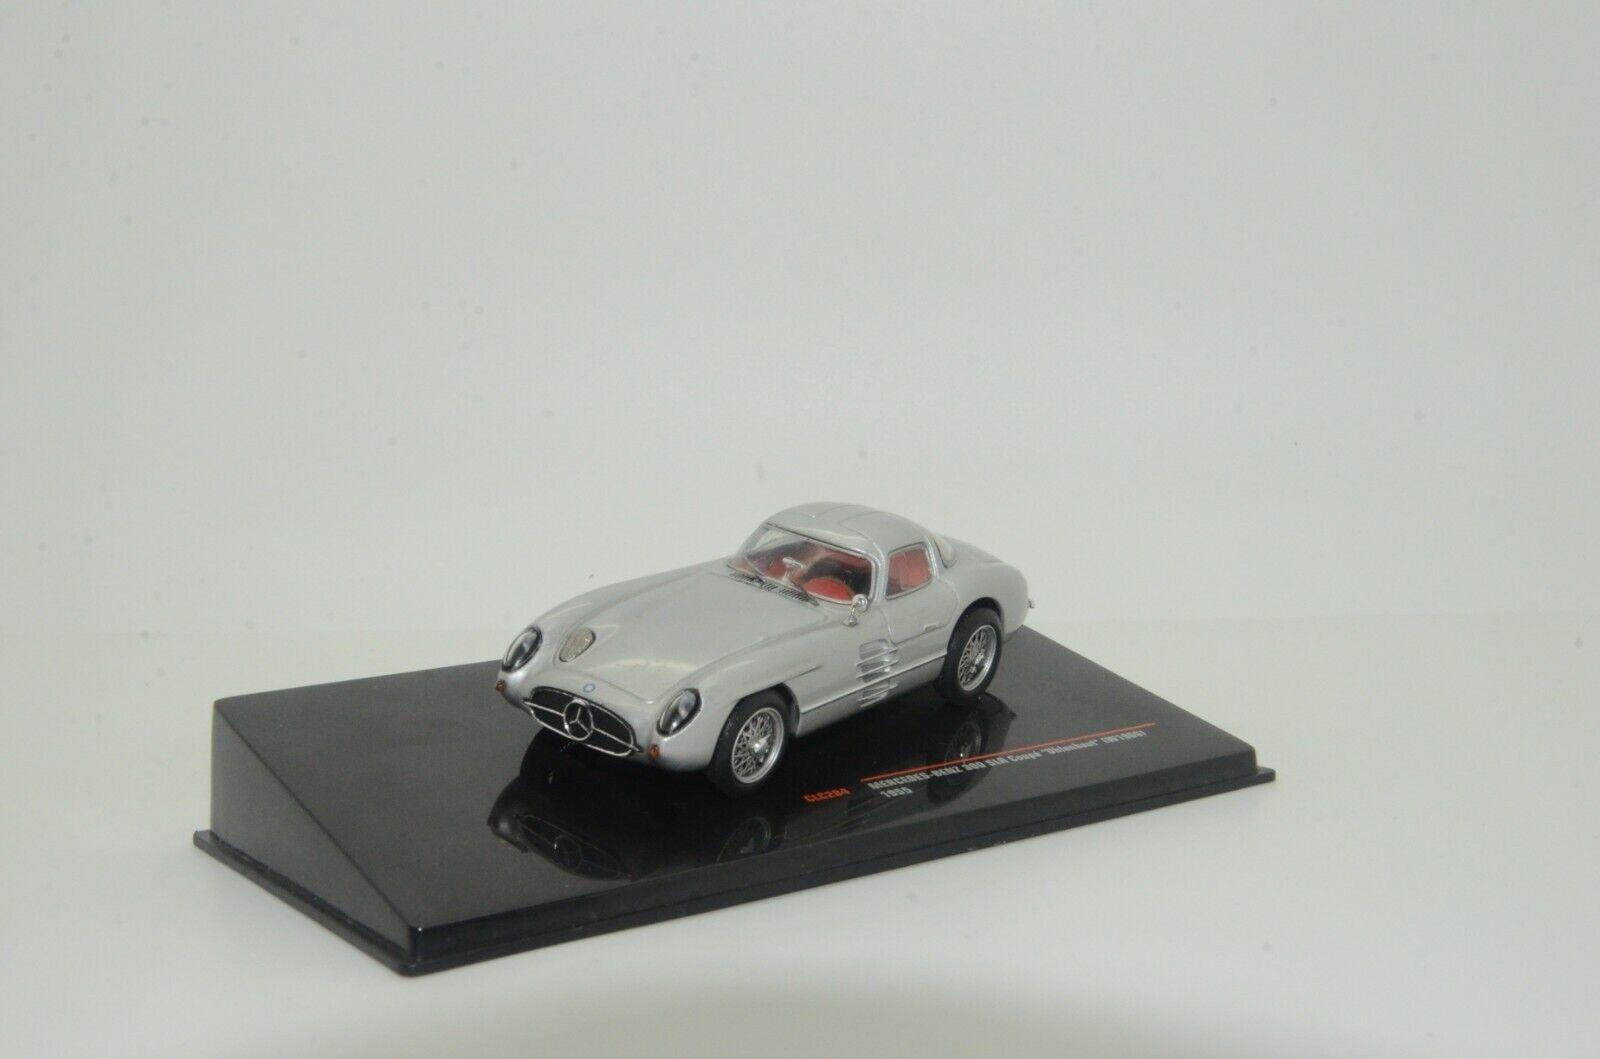 Mercedes Benz 300 SLR Coupe   Uhlenhaut   W196S 1955 IXO CLC284 1 43